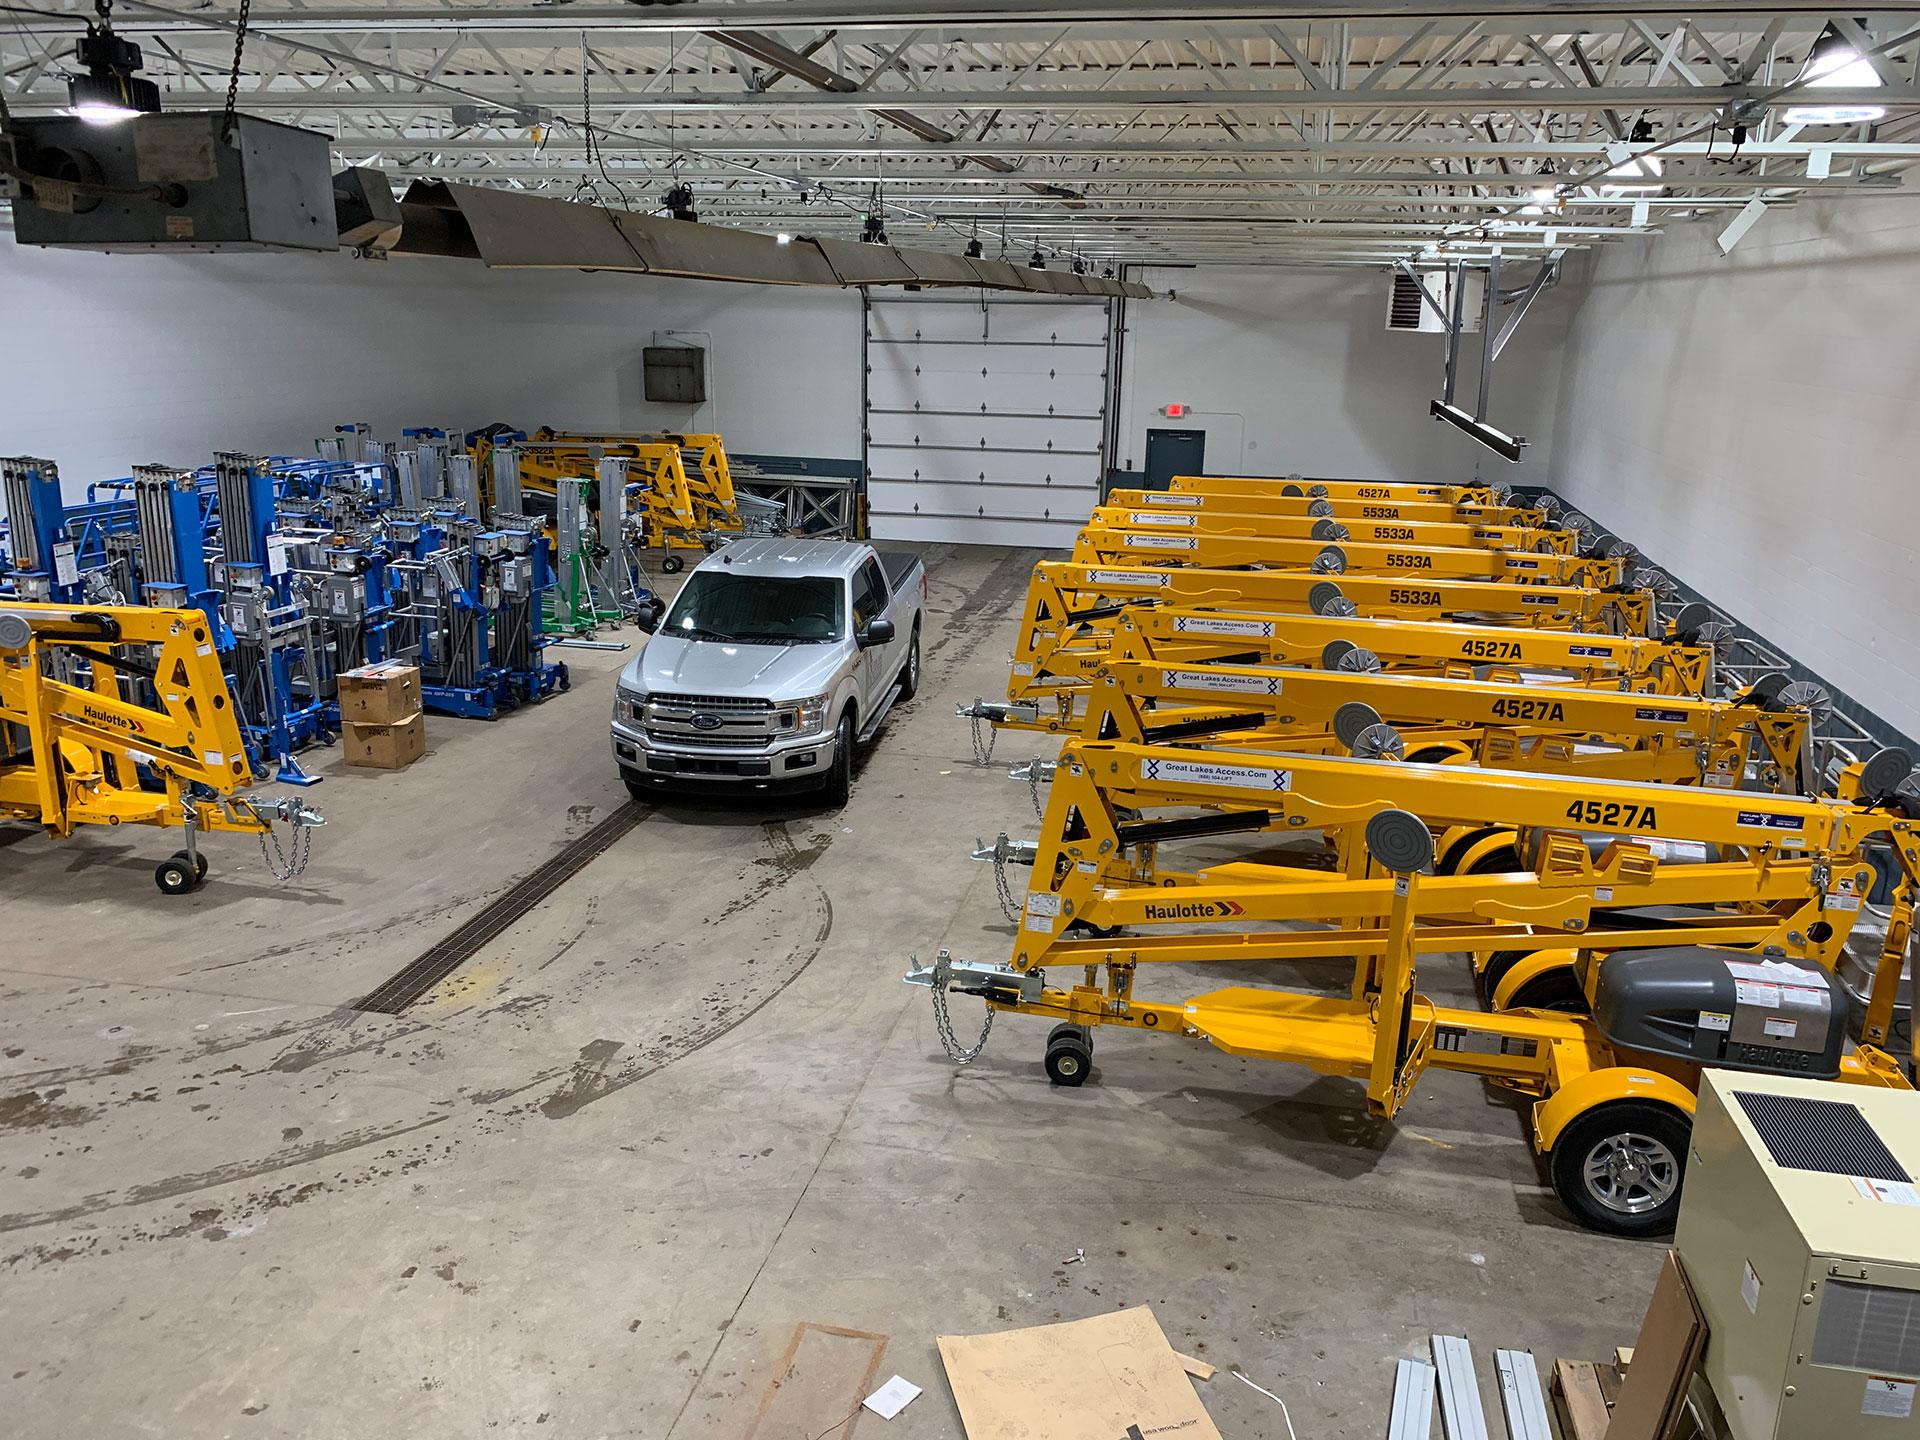 Rental equipment and truck inside garage